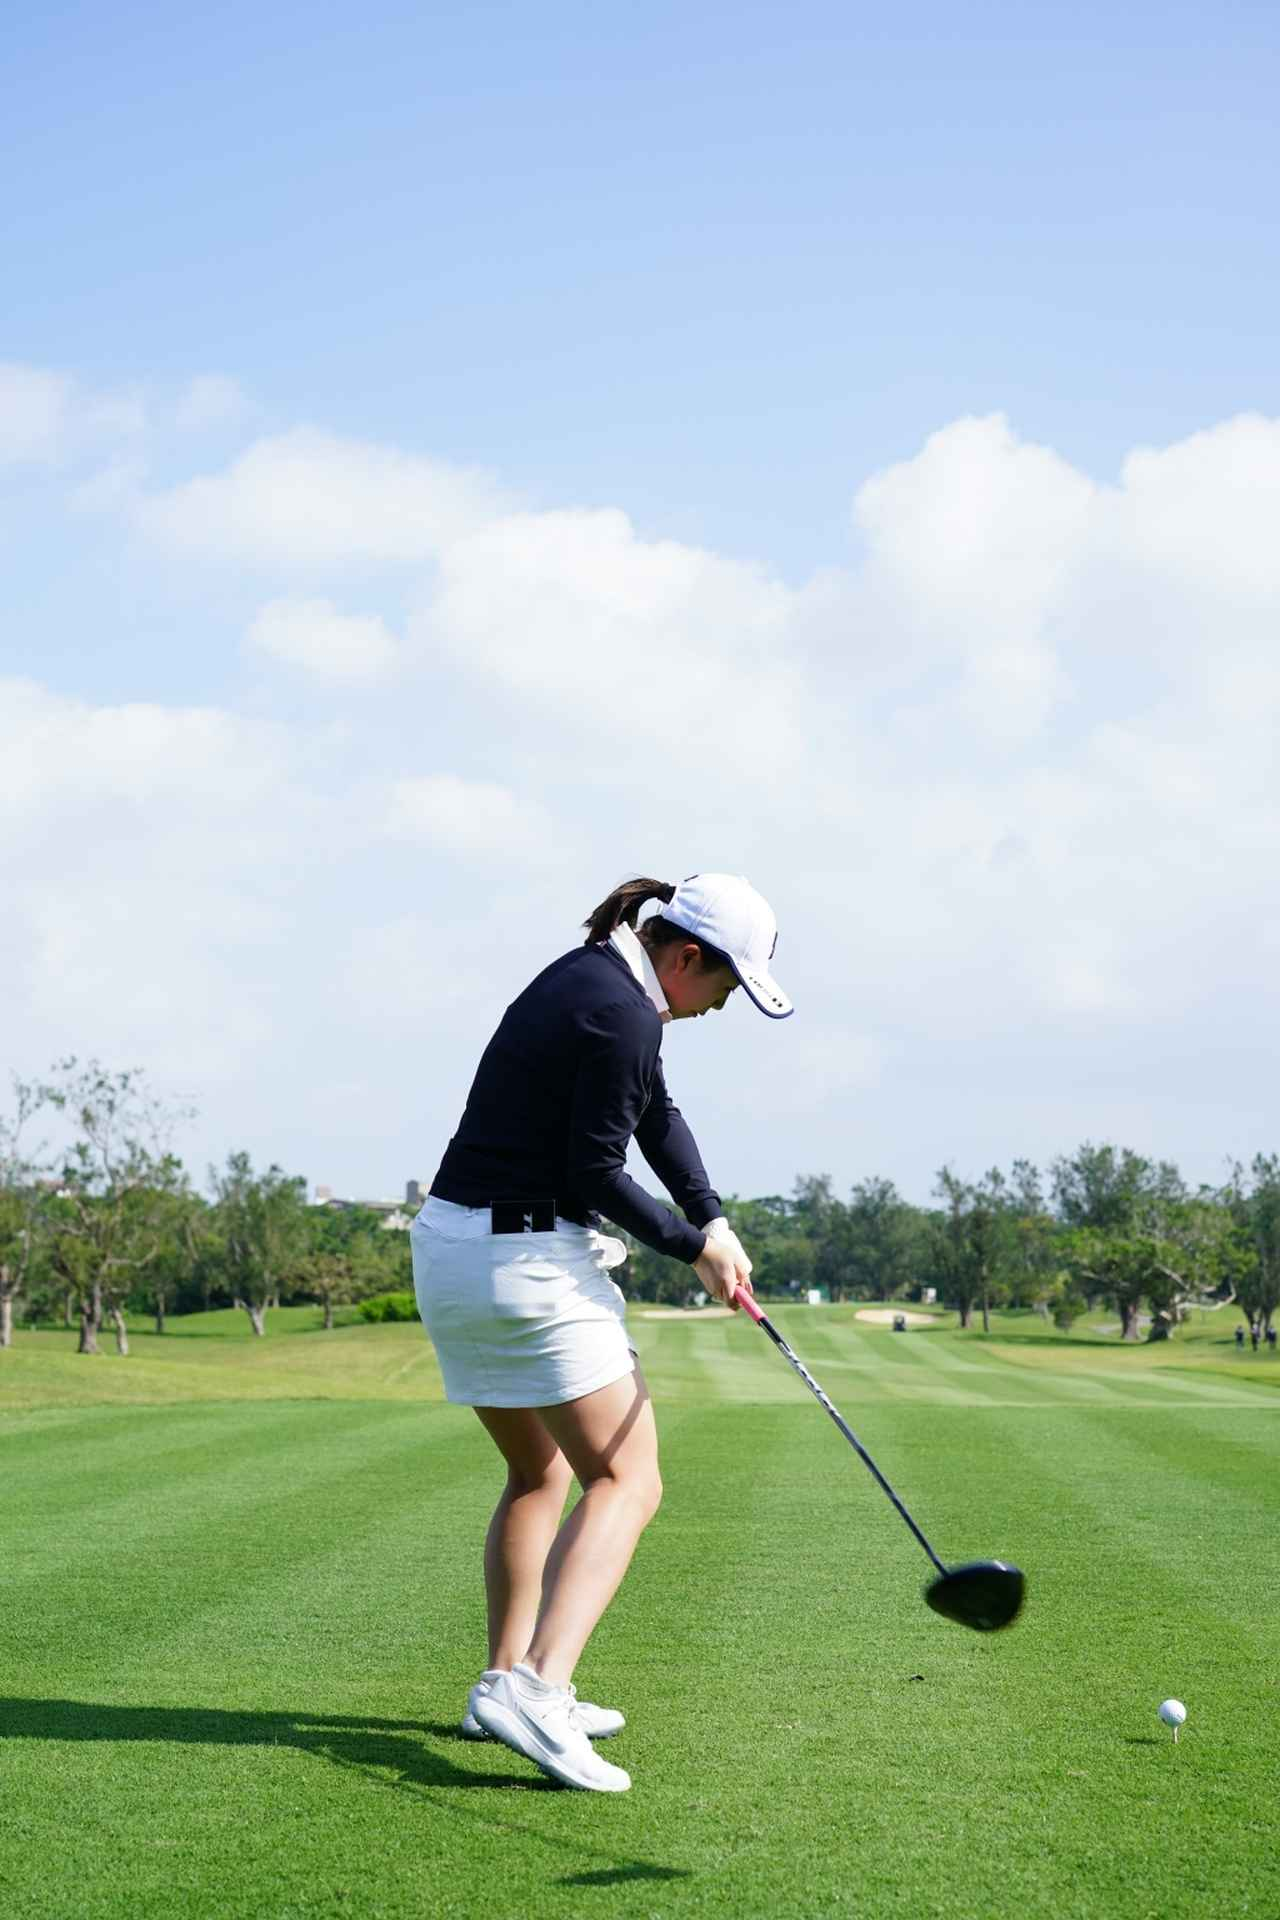 Images : 13番目の画像 - 丹萌乃のドライバー連続写真 - みんなのゴルフダイジェスト